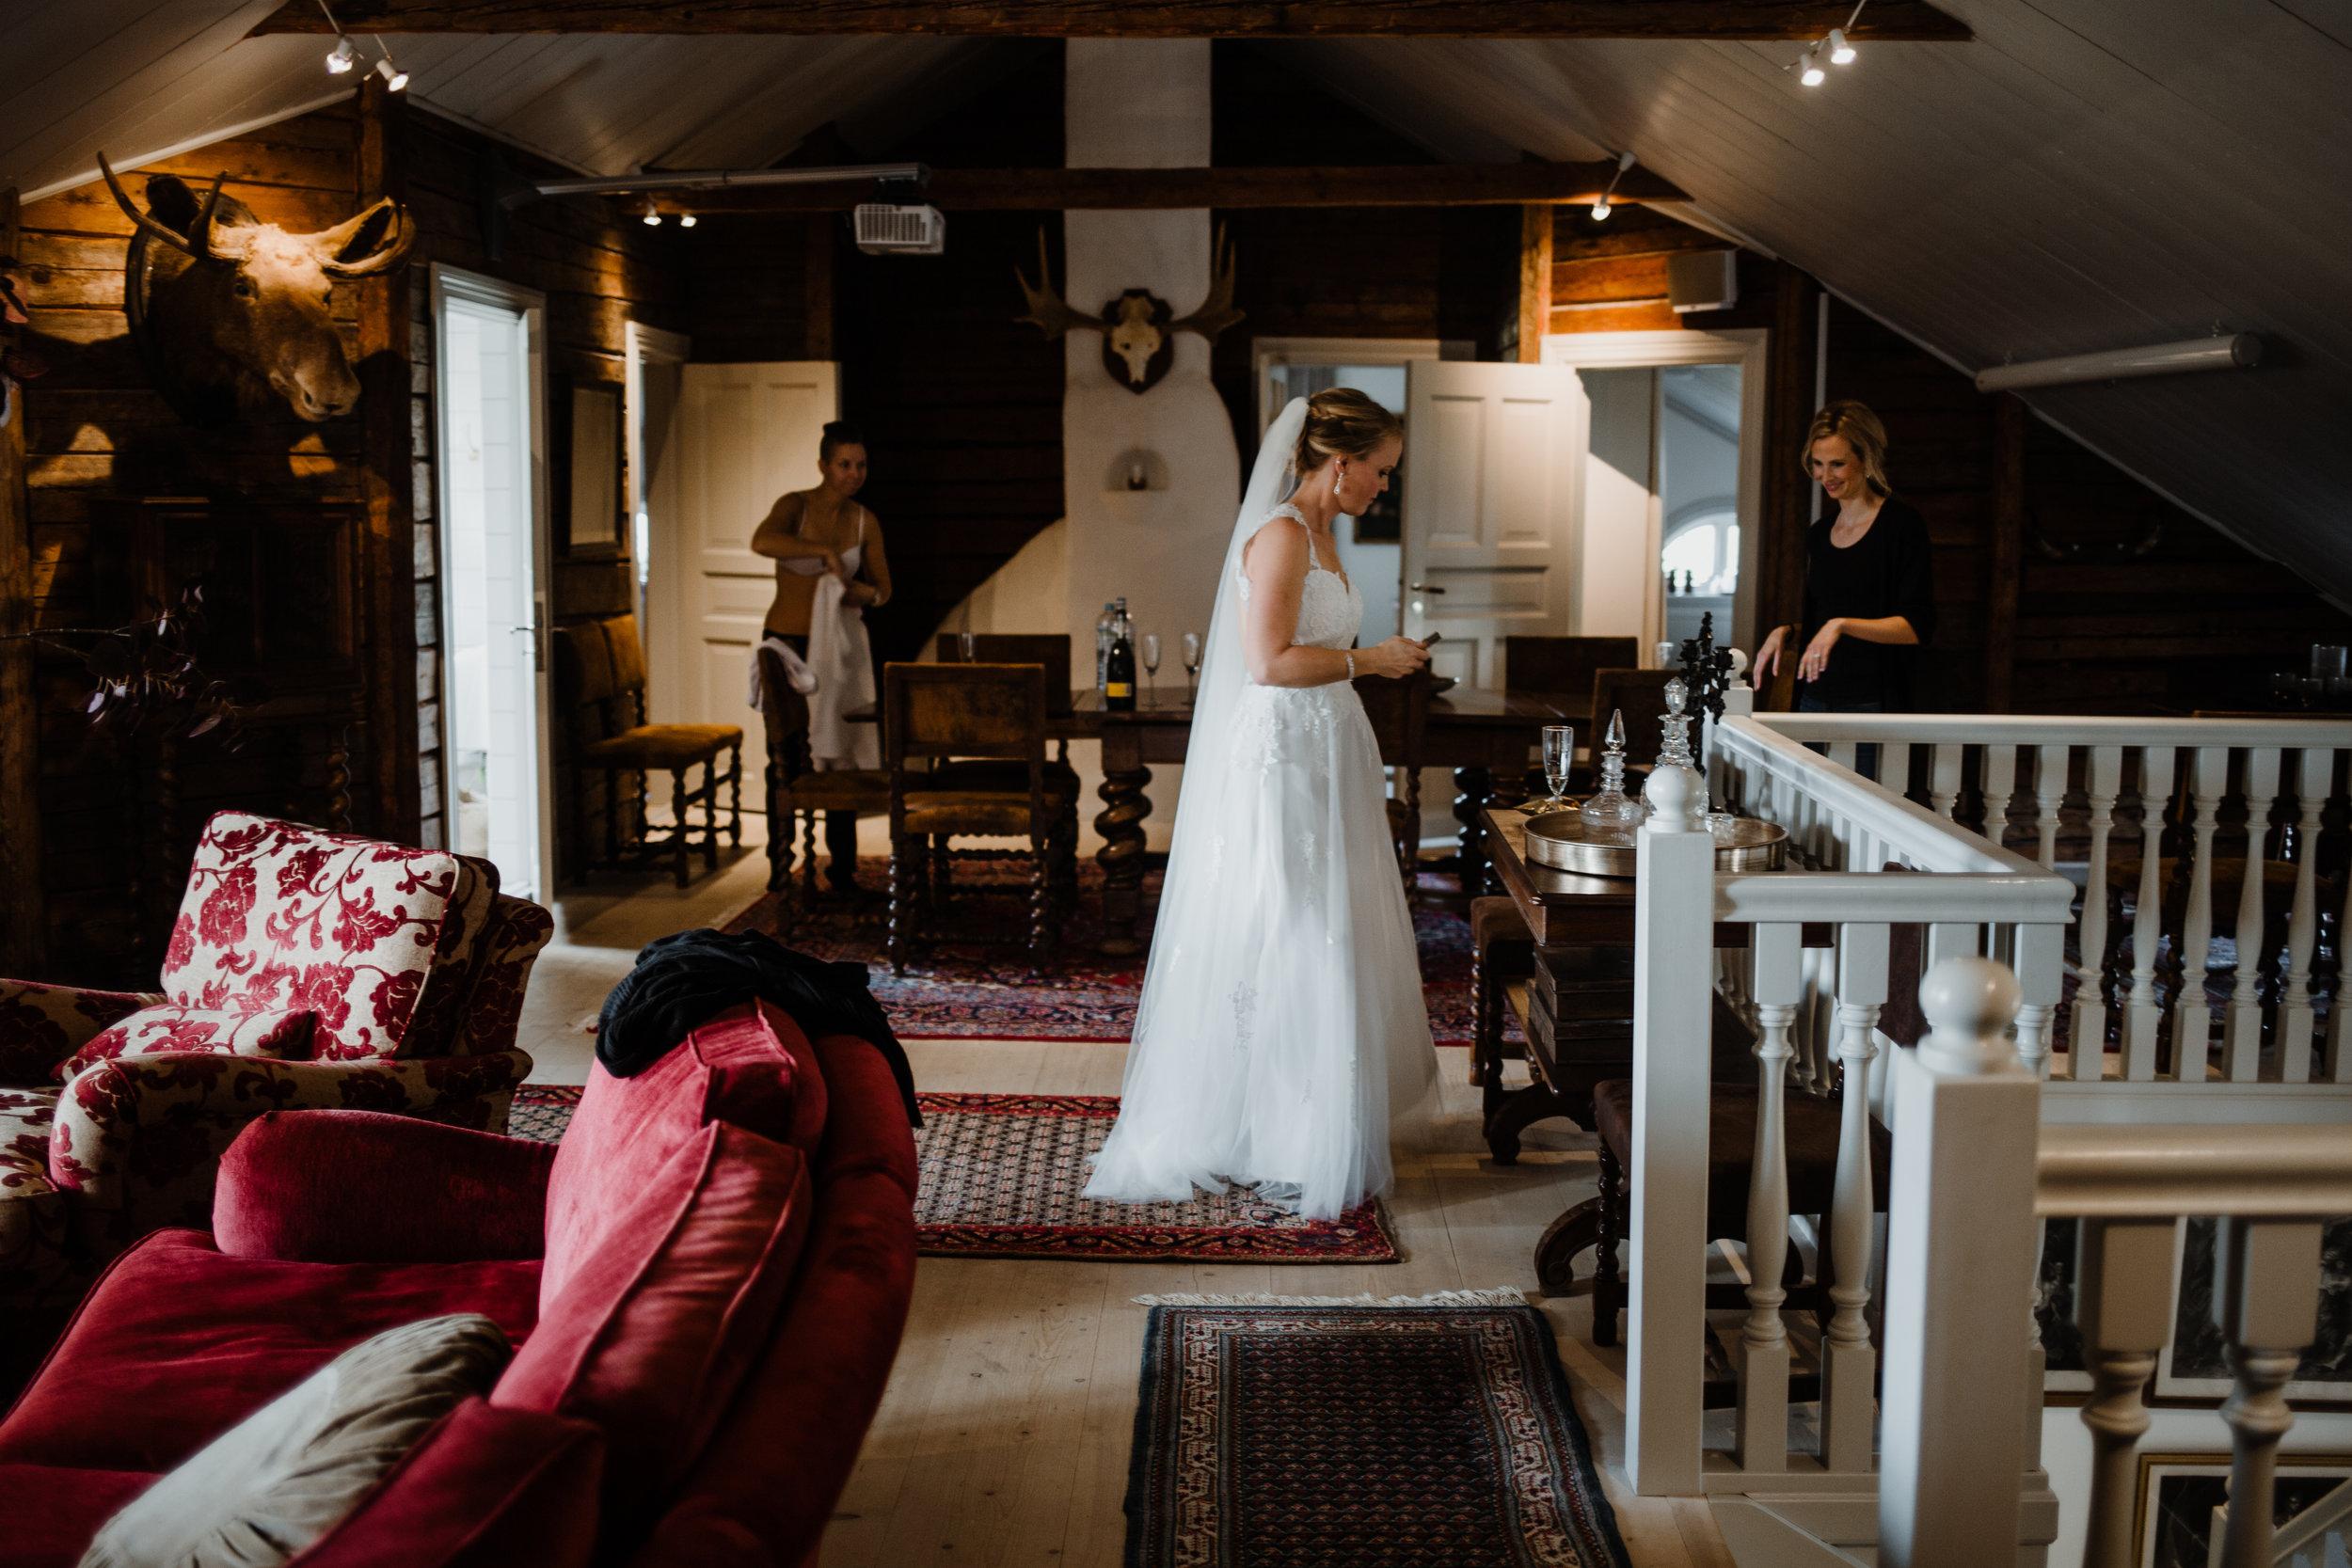 Bröllopsfotograf-Uddetorp Säteri-Höstbröllop-Fotograf Emilia- Bröllopsfotograf Borås-12.jpg